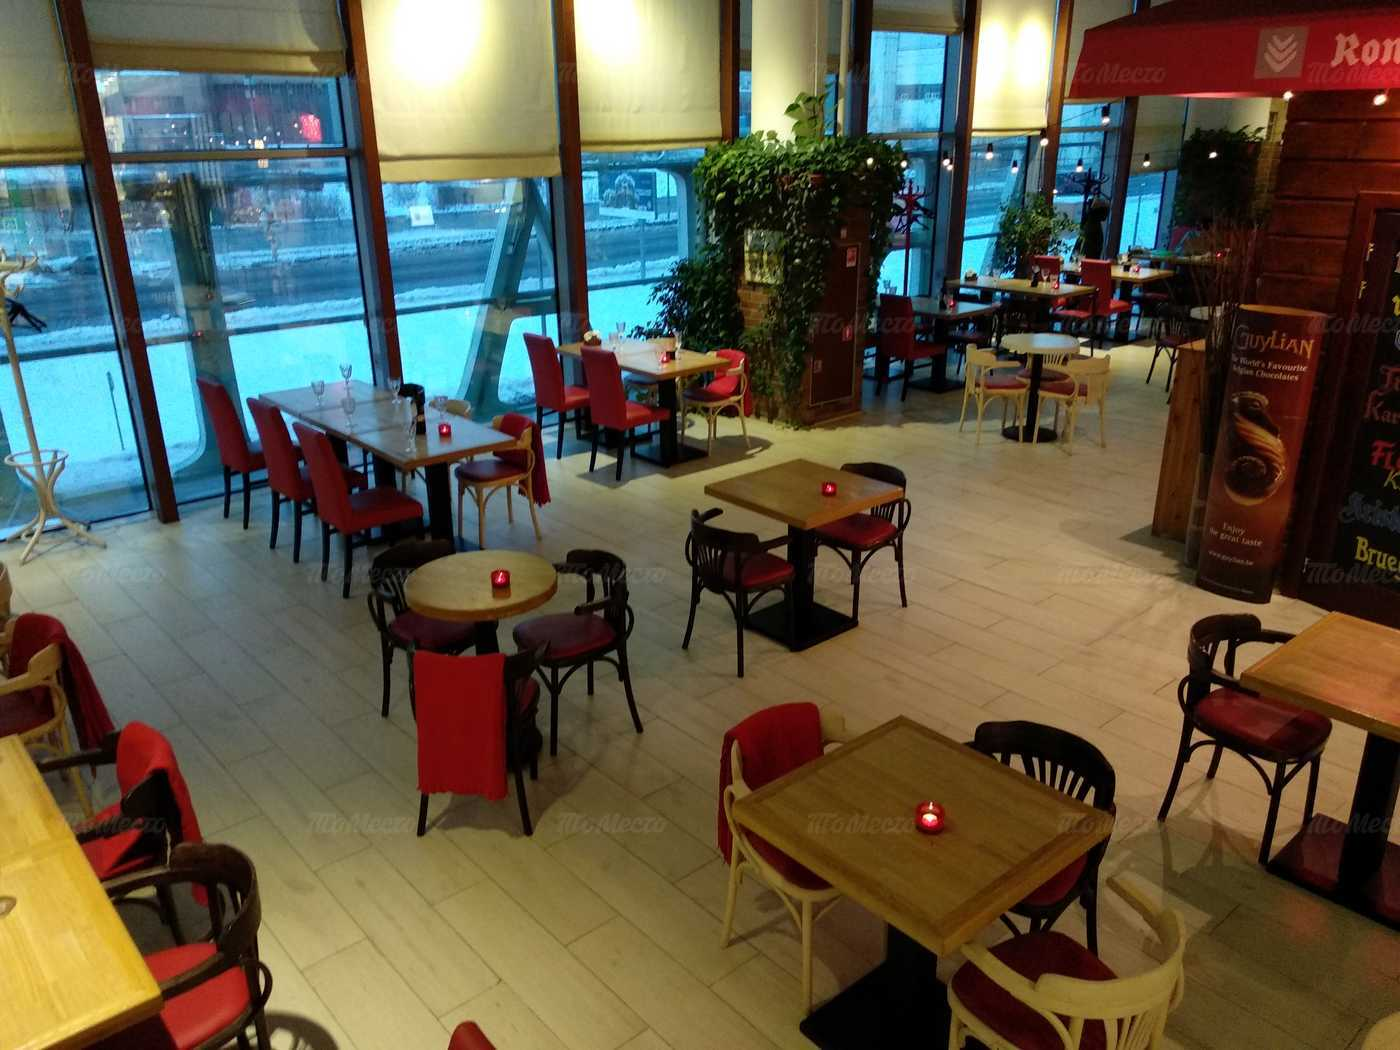 Кафе Rombouts (Ромбаутс) на Ходынском бульваре